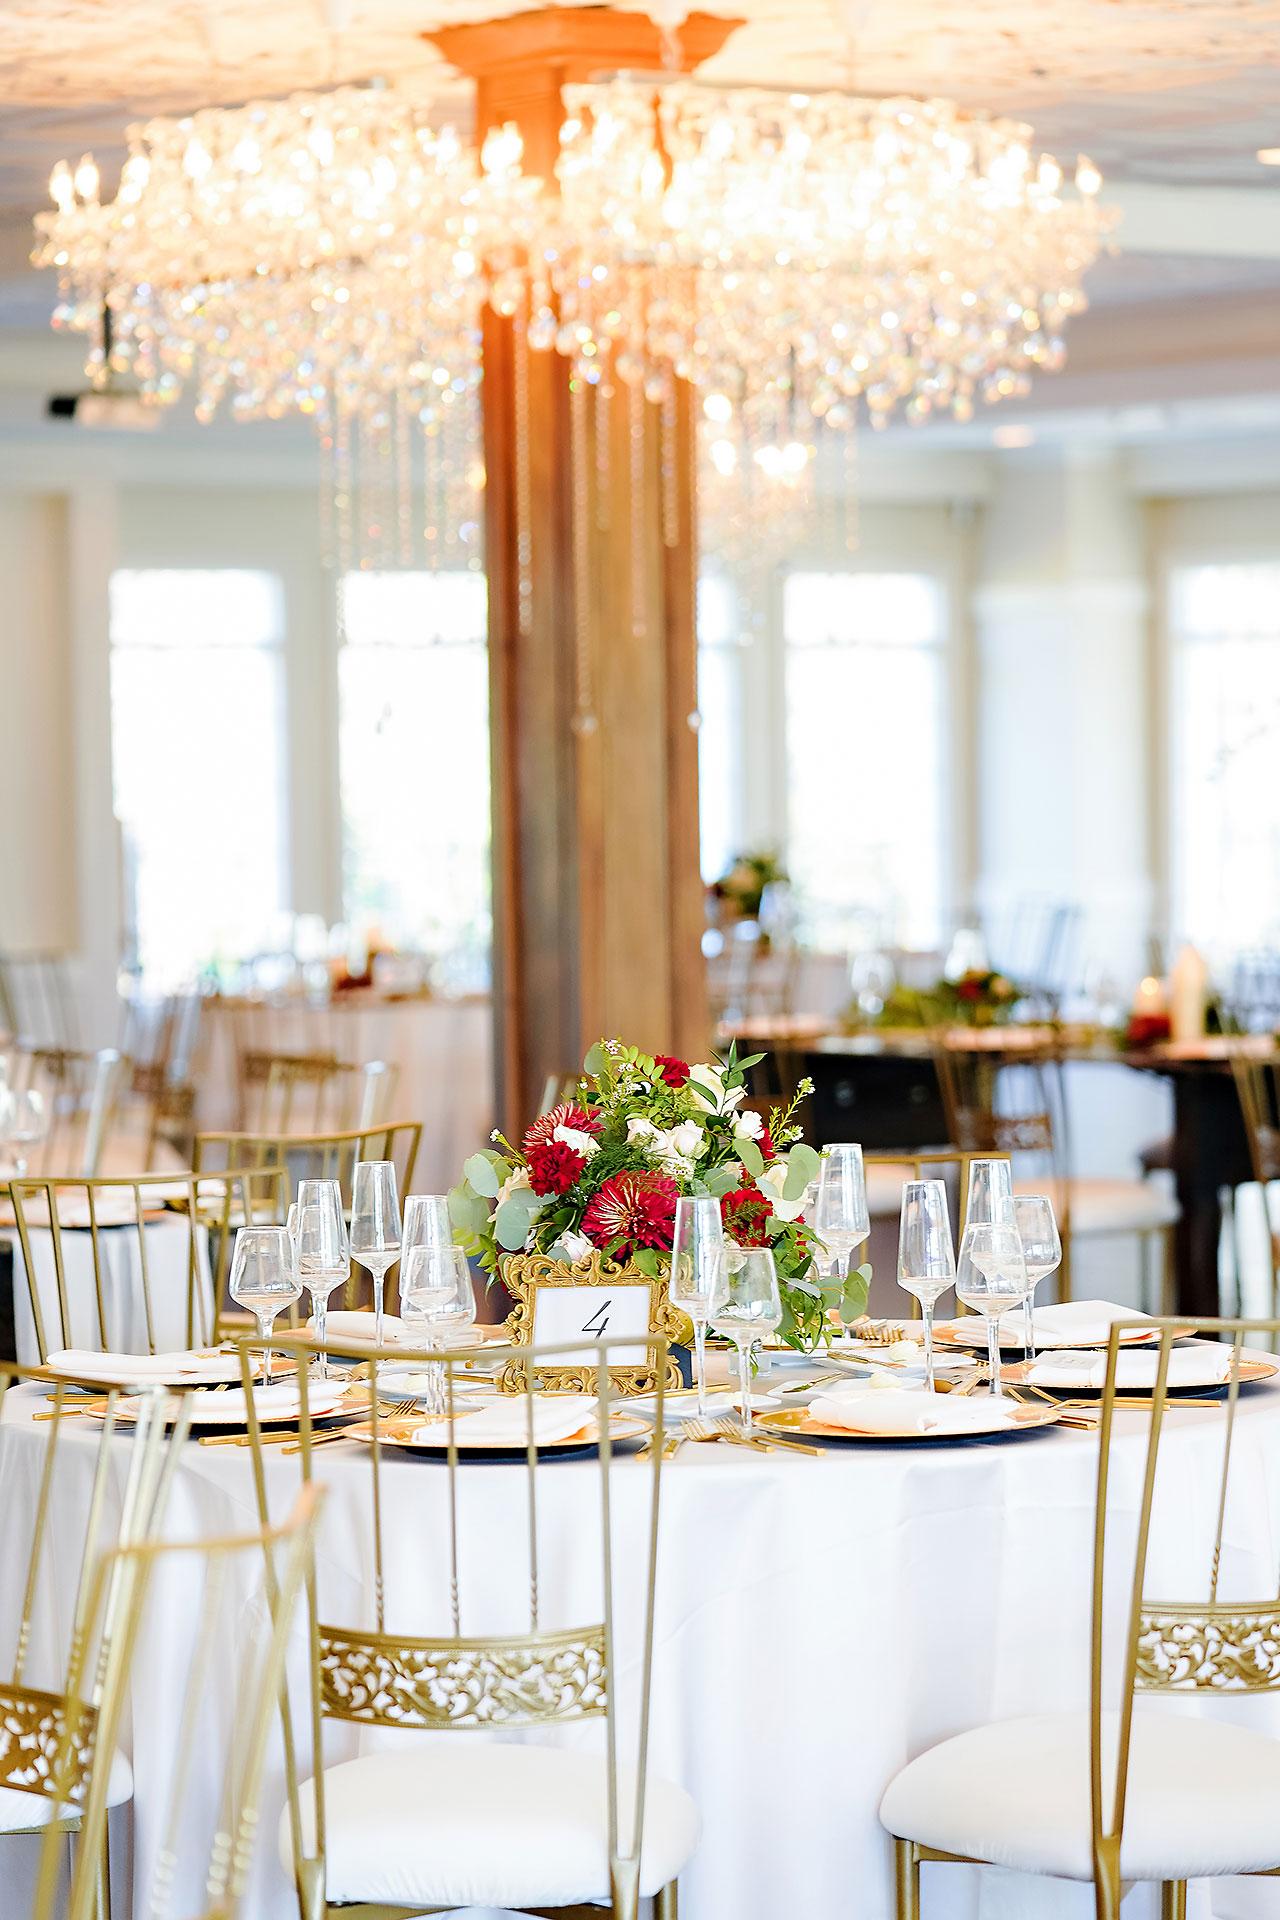 Nadia Parker Black Iris Estate Carmel Indiana Wedding May 2021 223